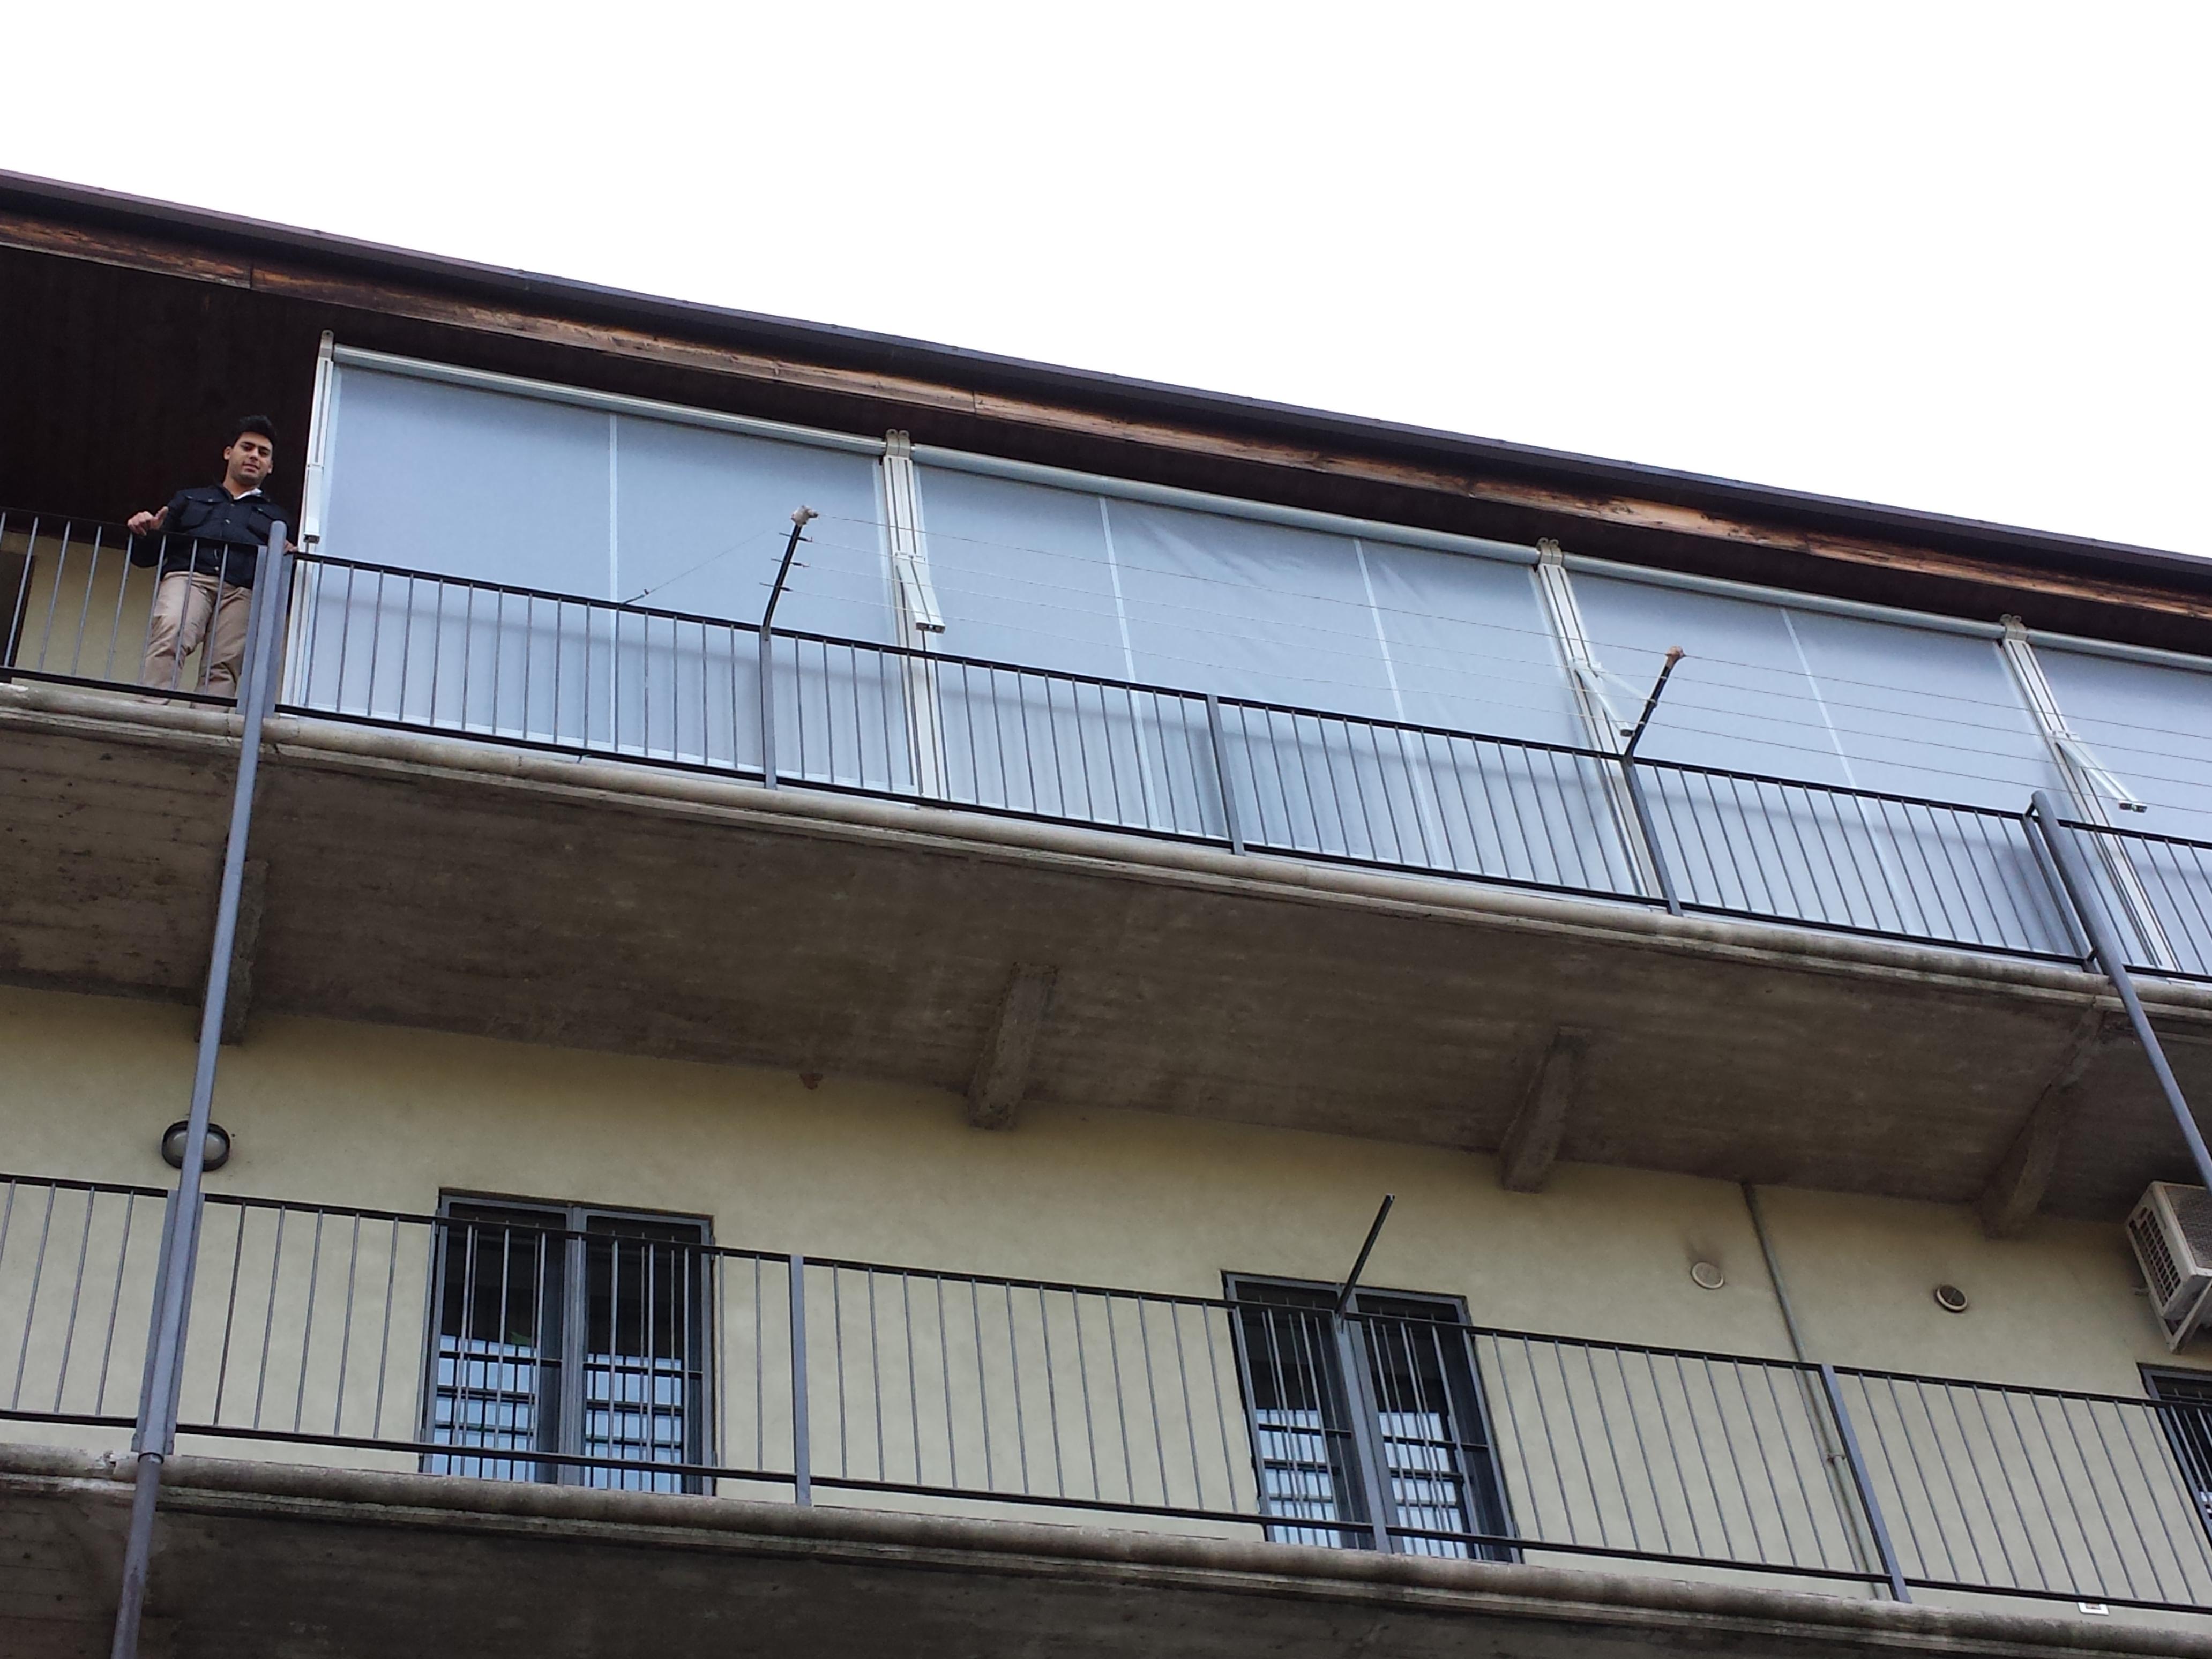 Tende Veranda Per Chiusure Invernali : Tende verande domino a torino garanzia anni